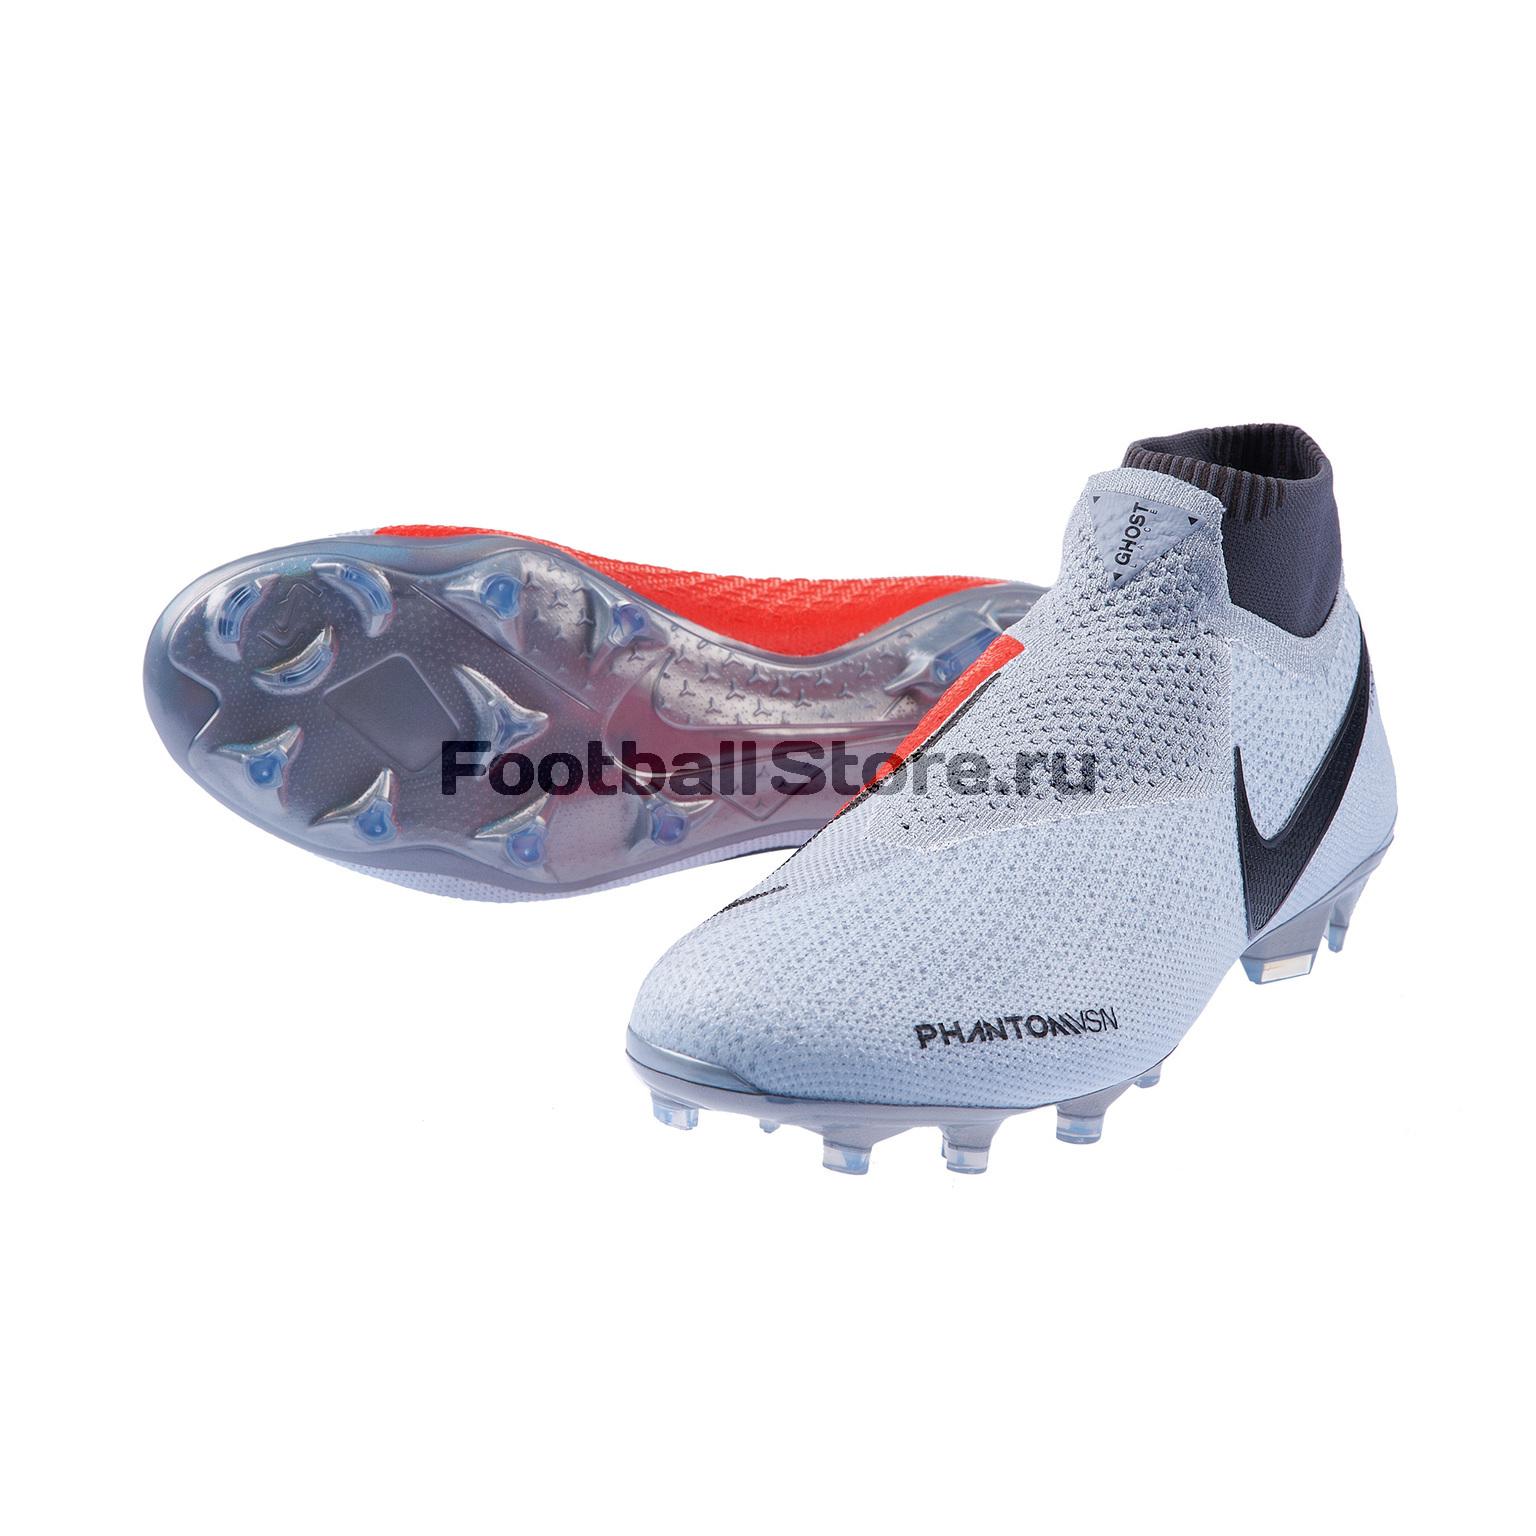 79ca1b42 Бутсы Nike Phantom Vision Elite DF FG AO3262-060 – купить бутсы в ...